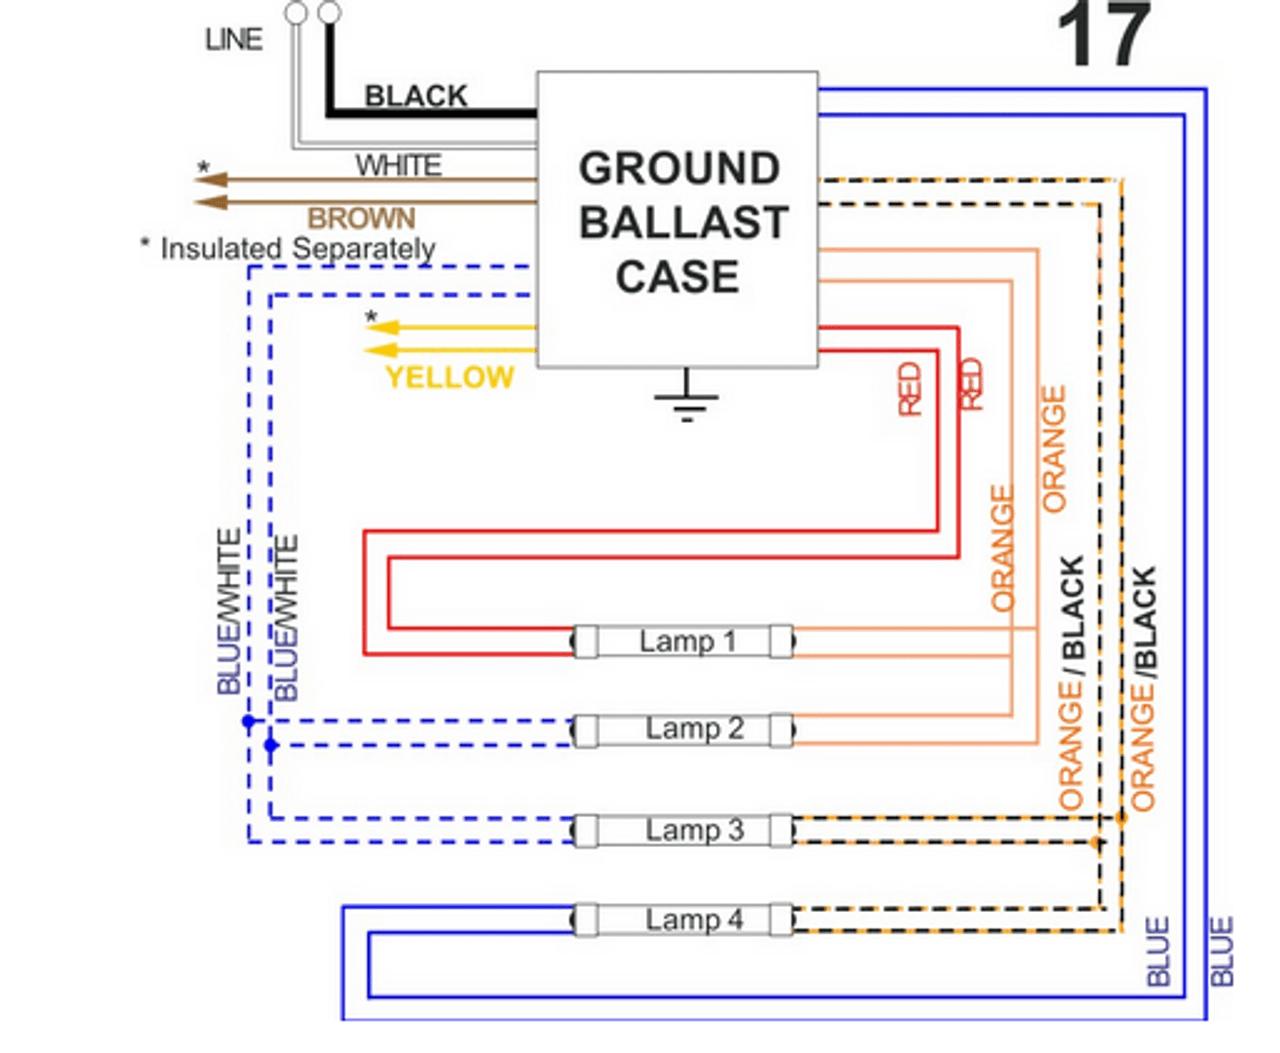 medium resolution of allanson 648 at magnetic sign ballast 8 to 24 feet total length allanson ballast wiring diagram allanson ballast wiring diagram